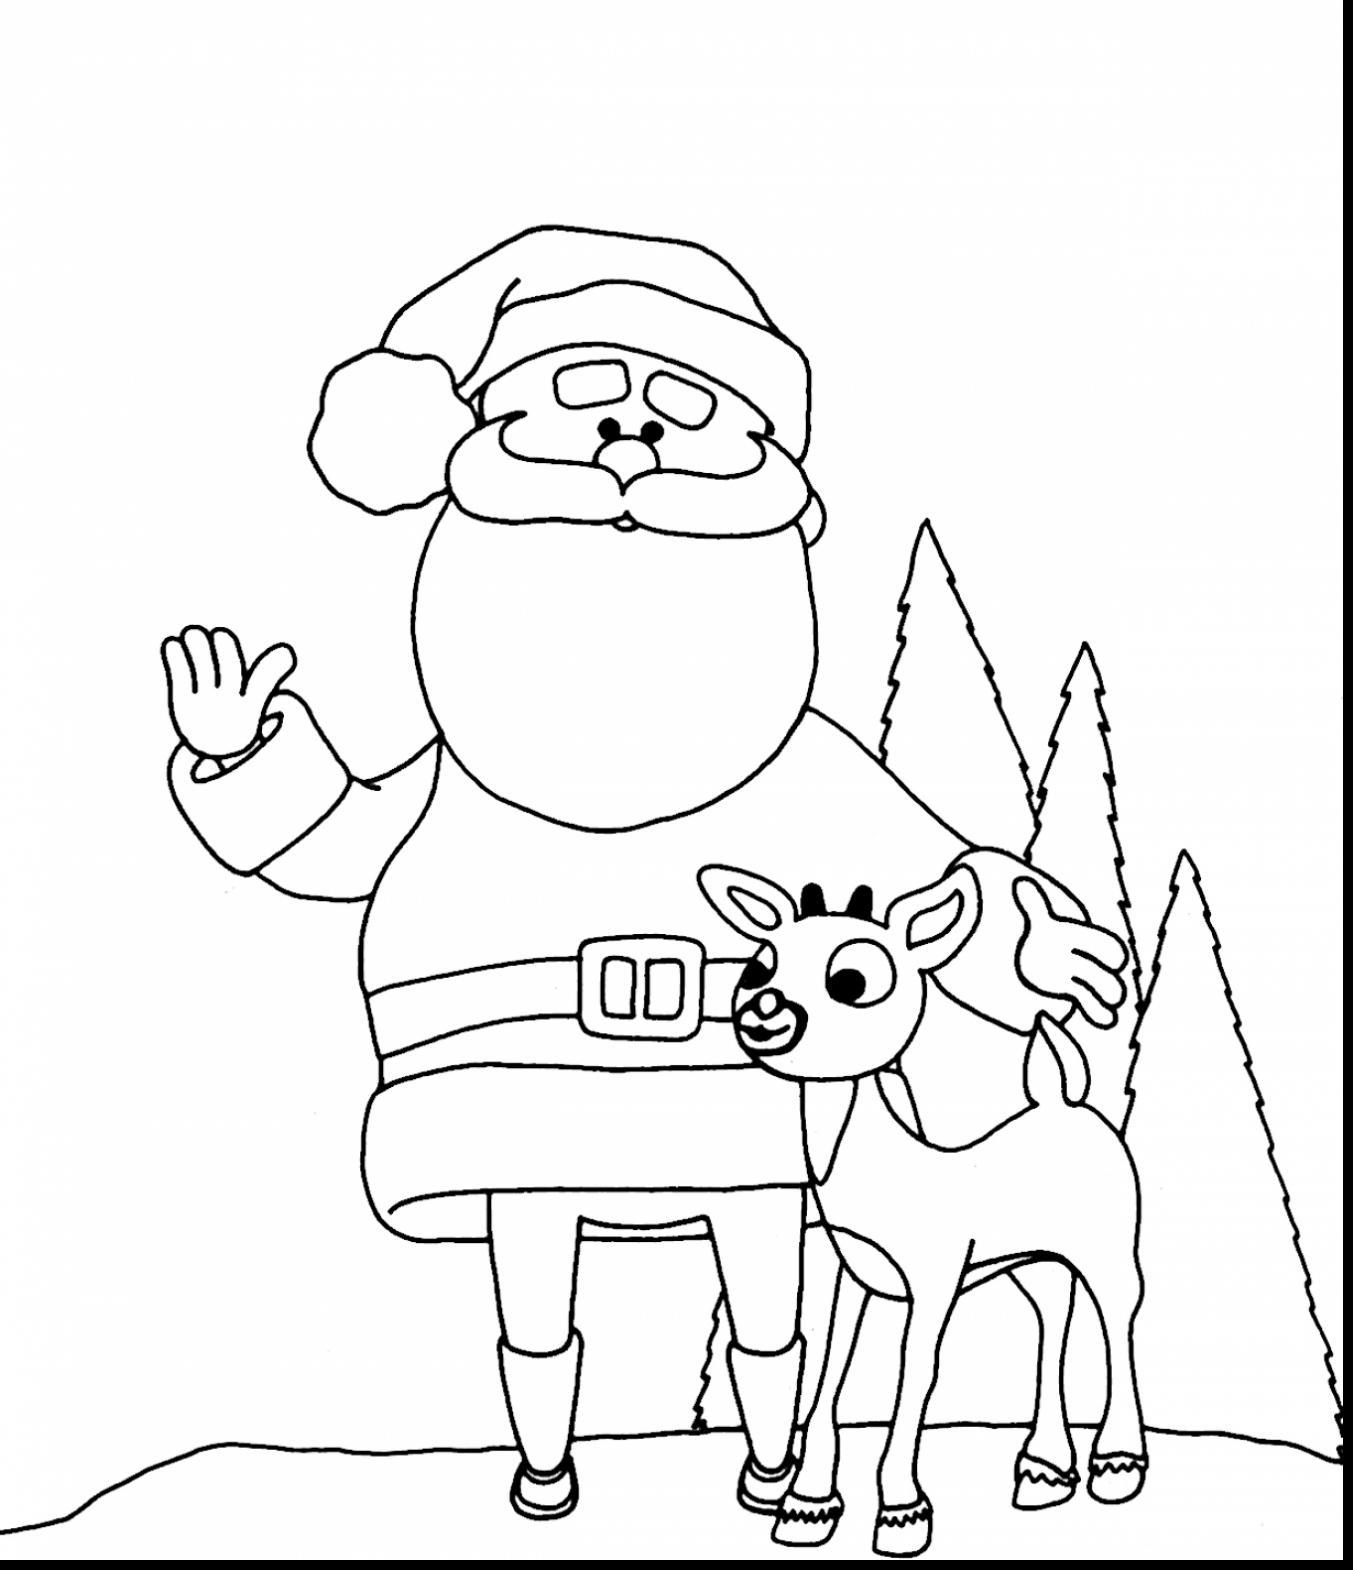 1353x1570 Reindeer Coloring Pages Free Simple